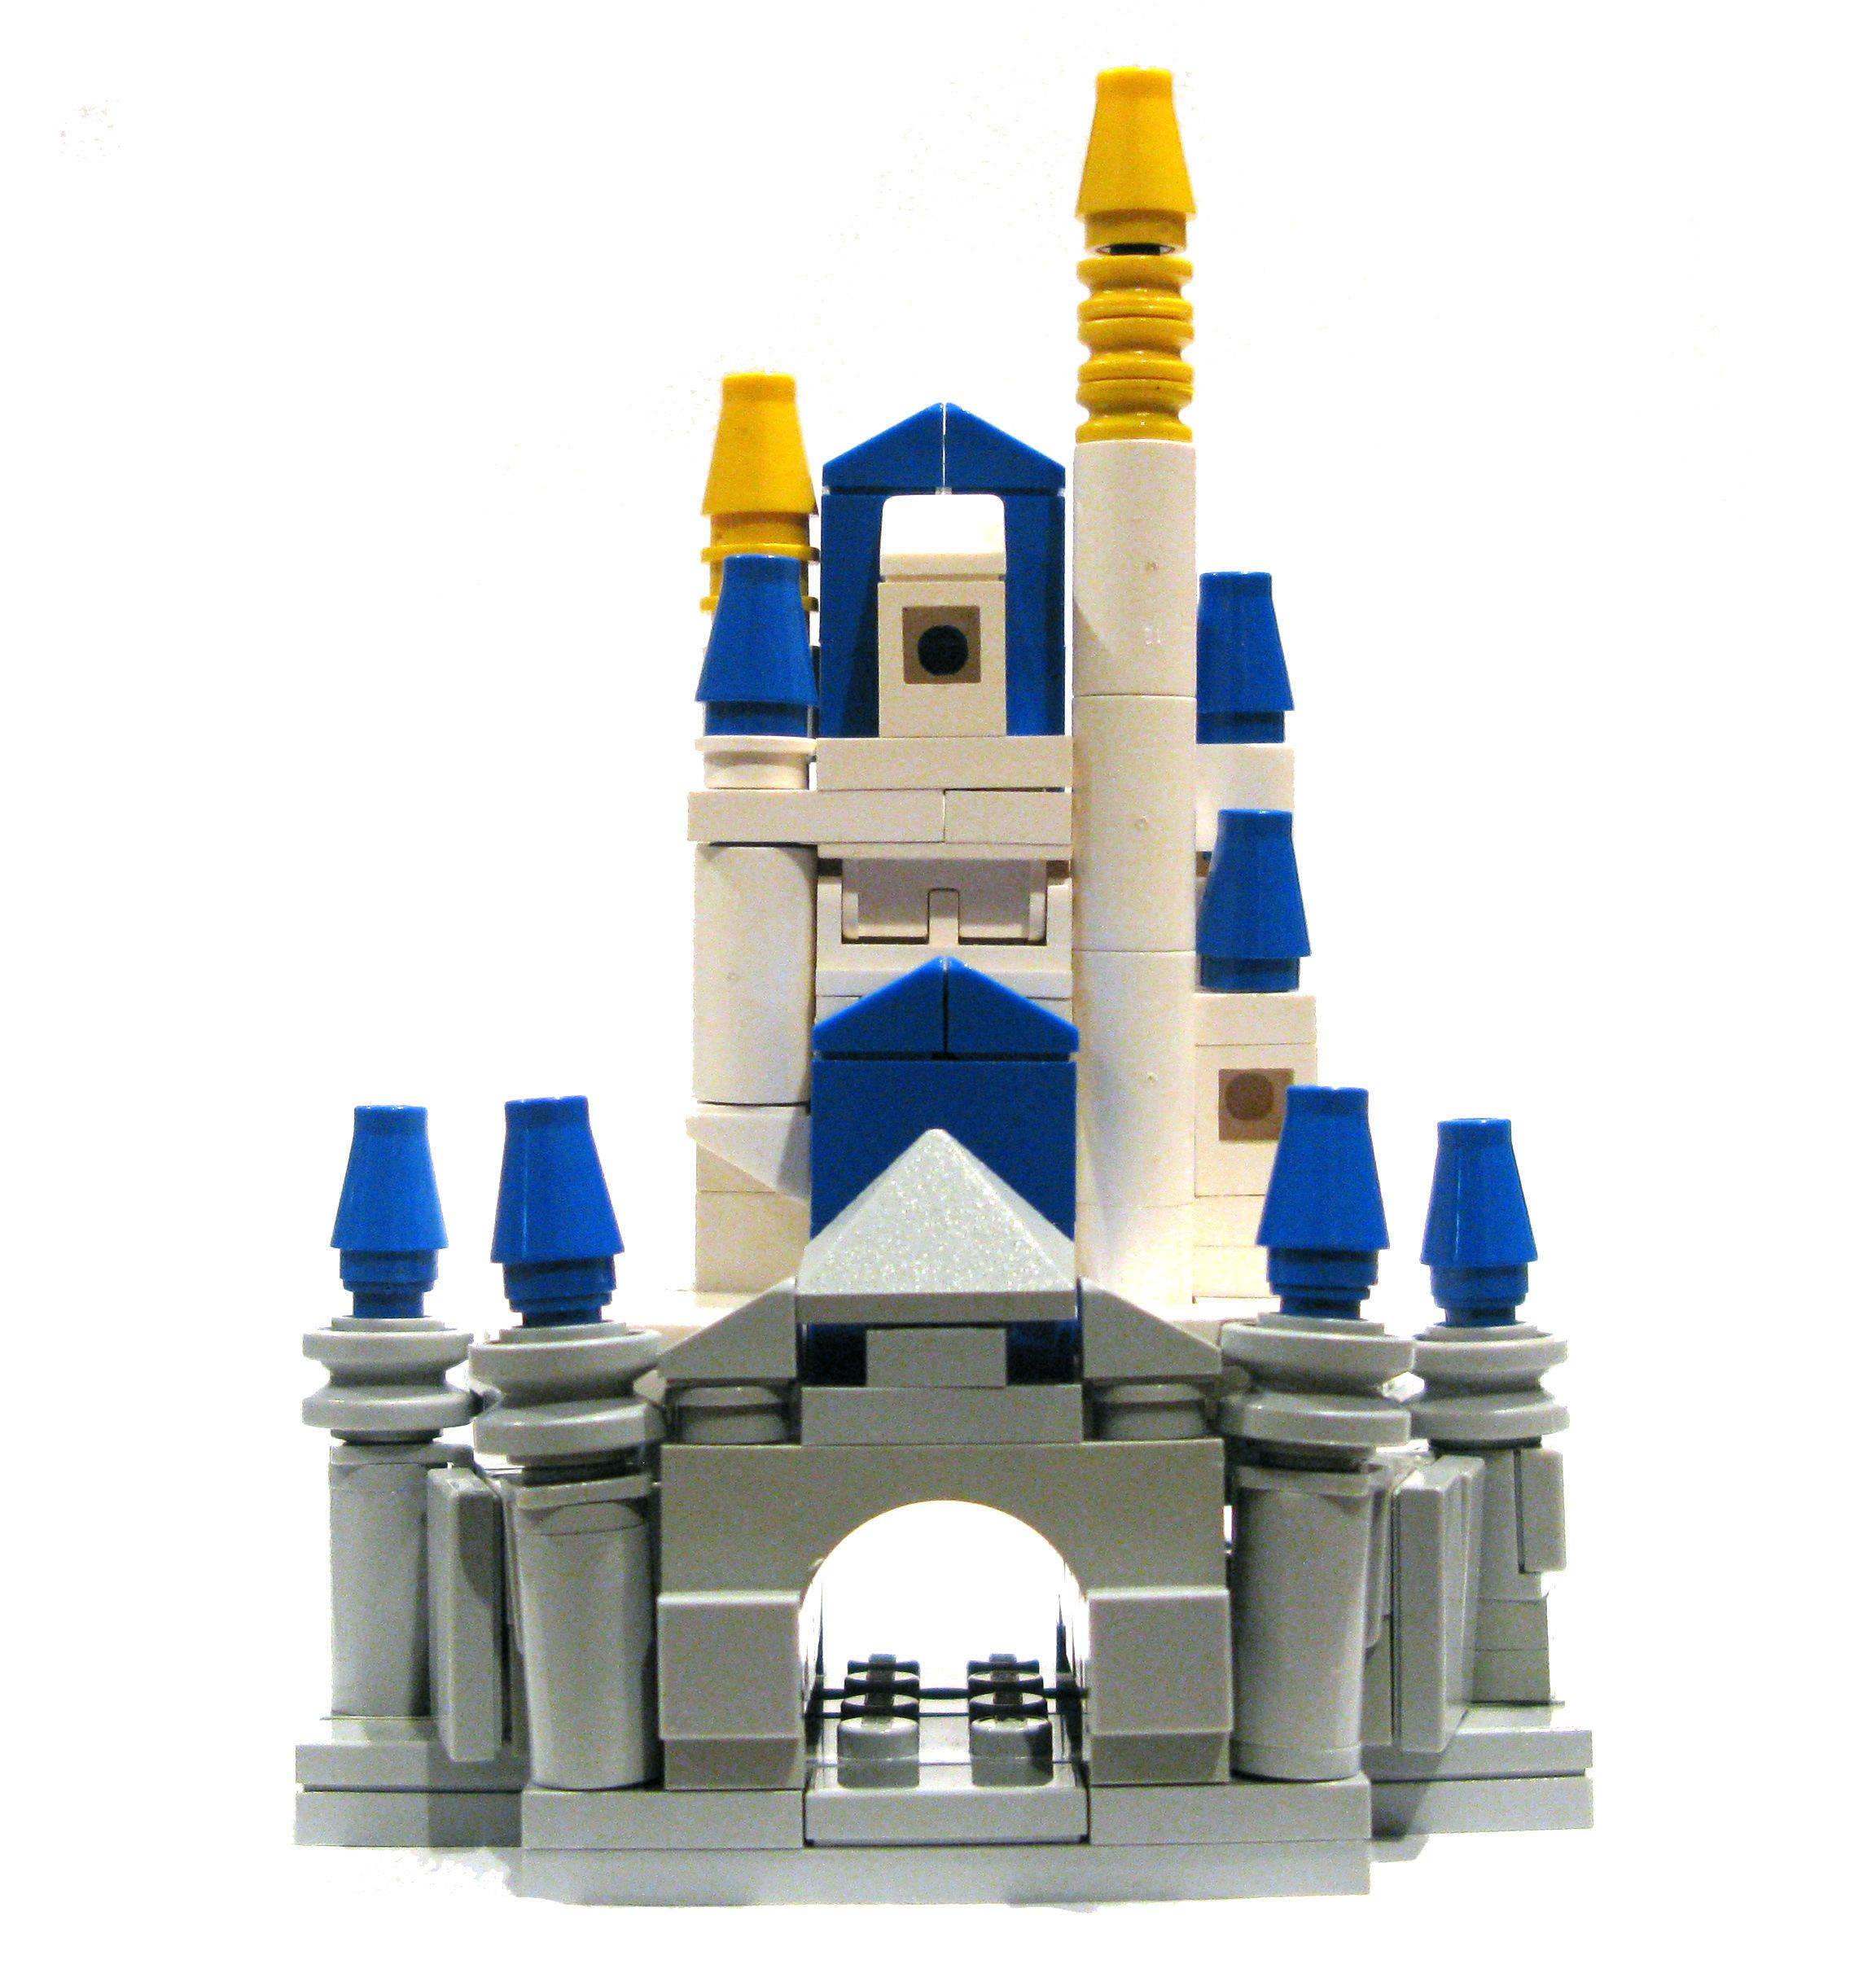 lego micro scale cinderella castle moc lego lego lego pinterest brauch und geschenk. Black Bedroom Furniture Sets. Home Design Ideas